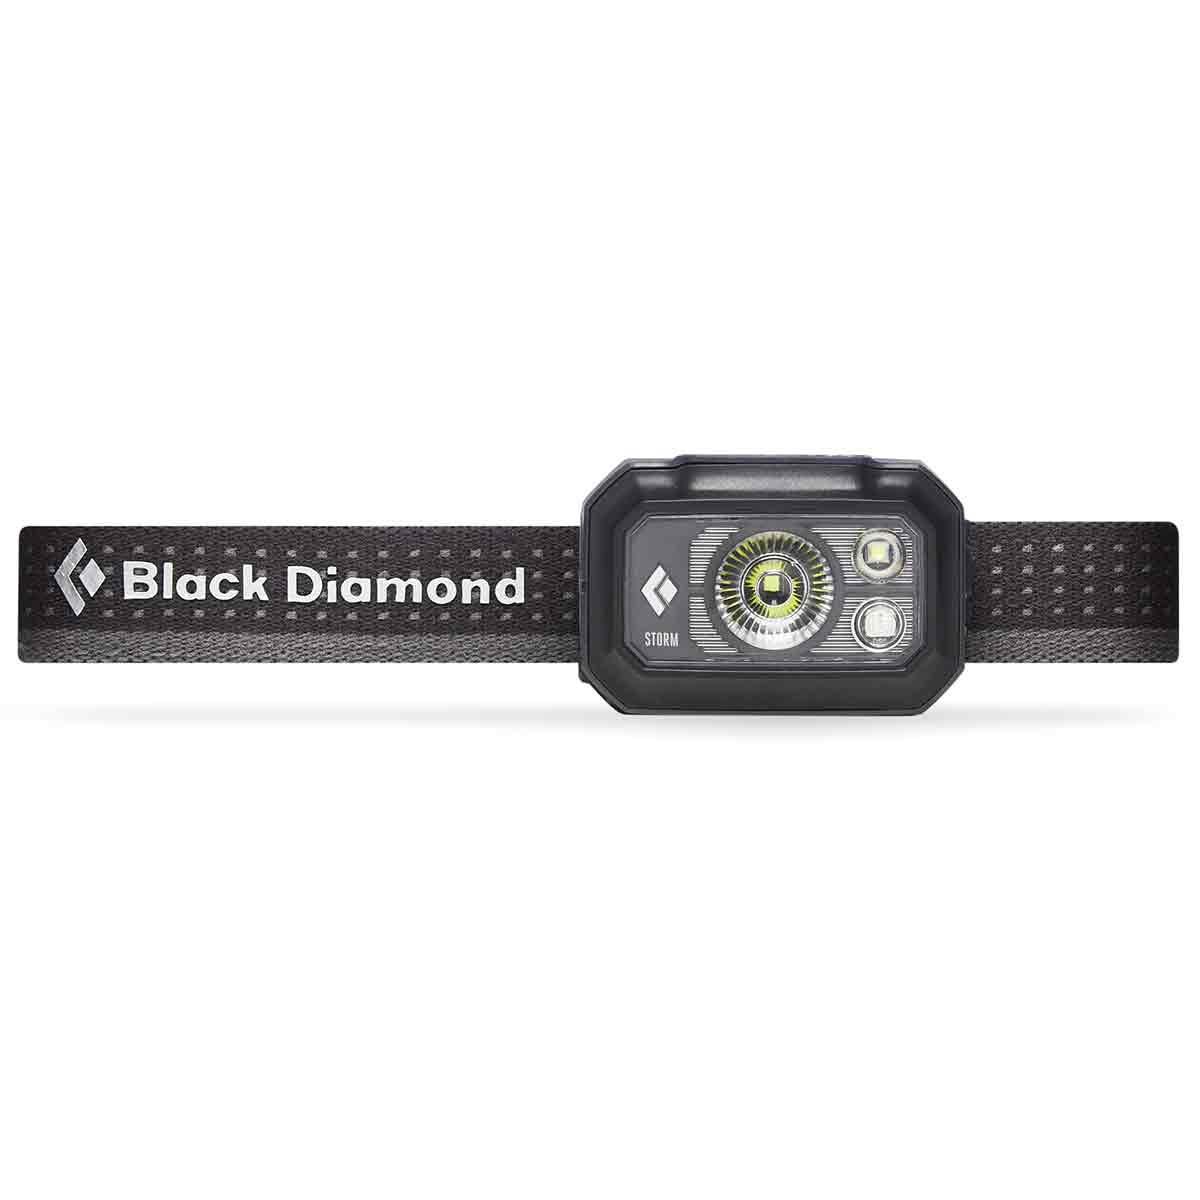 Black Diamond Storm 375